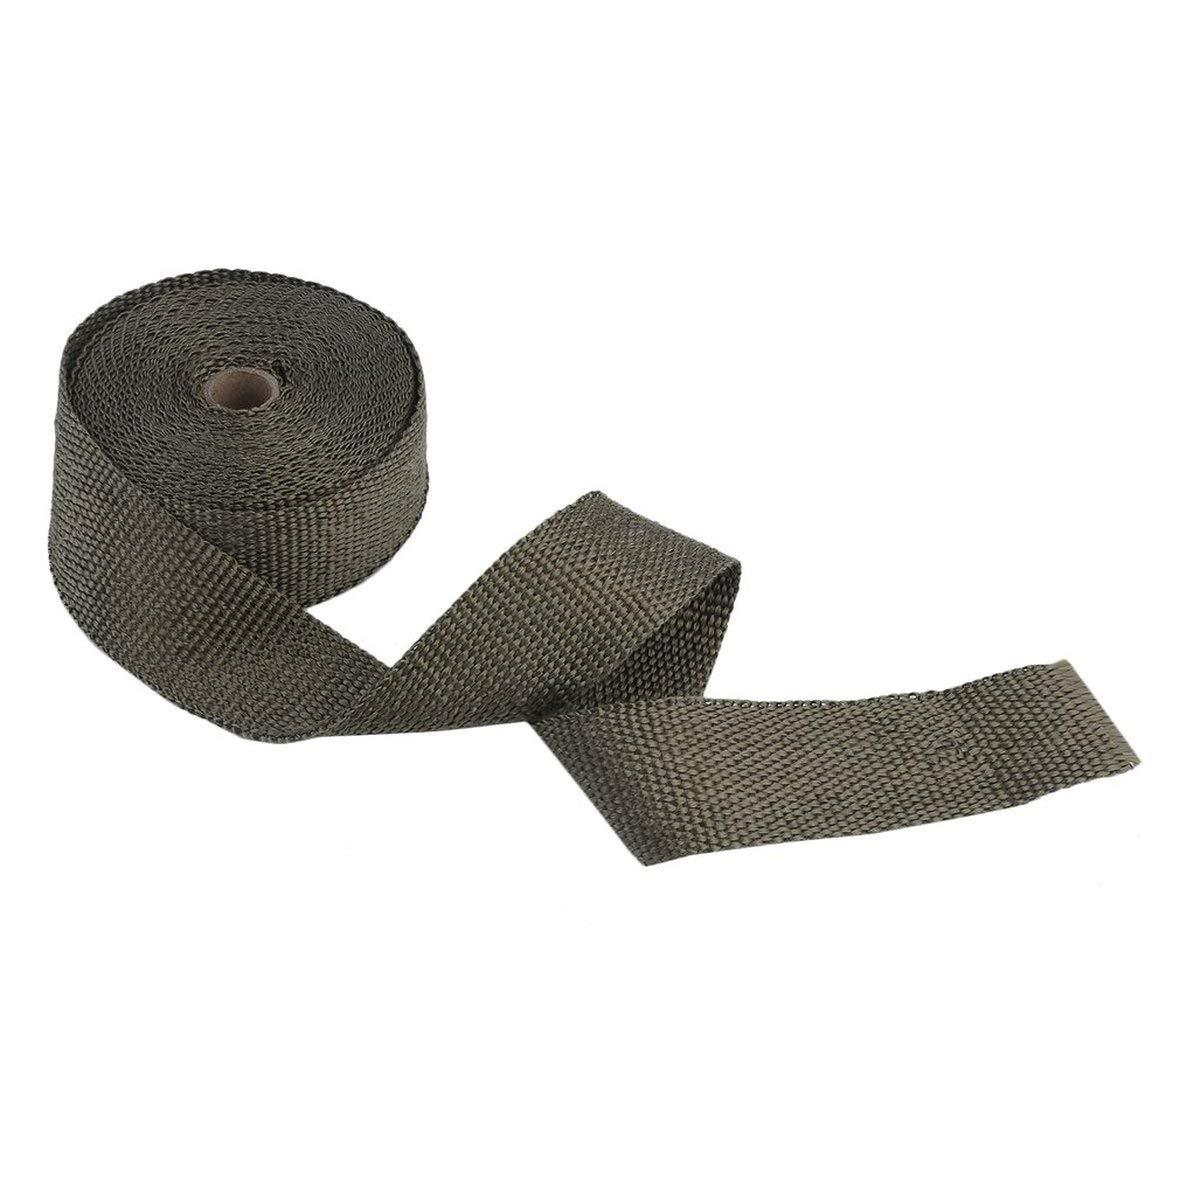 32.8ft 2 ST/ÜCKE Titan Auspuff Wrap Shield Schutzband feuerfeste Isolierband 20 St/ück Metall Ring Schleife W/ärmeschutzband 10 Meter